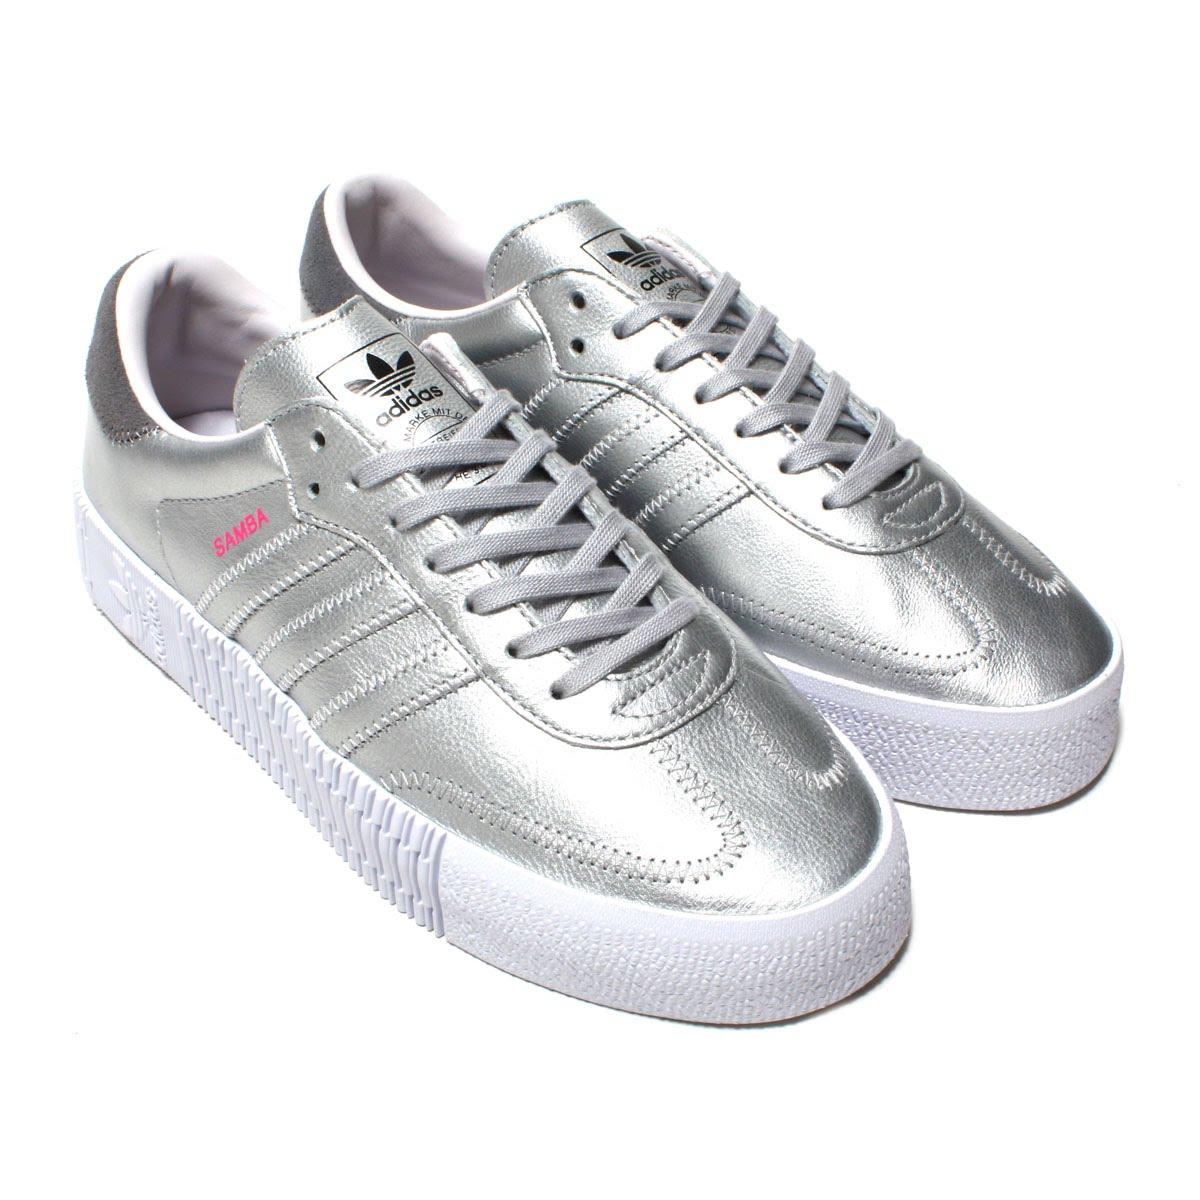 adidas Originals SAMBAROSE W LL(アディダス オリジナルス サンバローズW LL)SILVER MET/SILVER MET/ORCHID TINT【メンズ レディース スニーカー】18FW-I